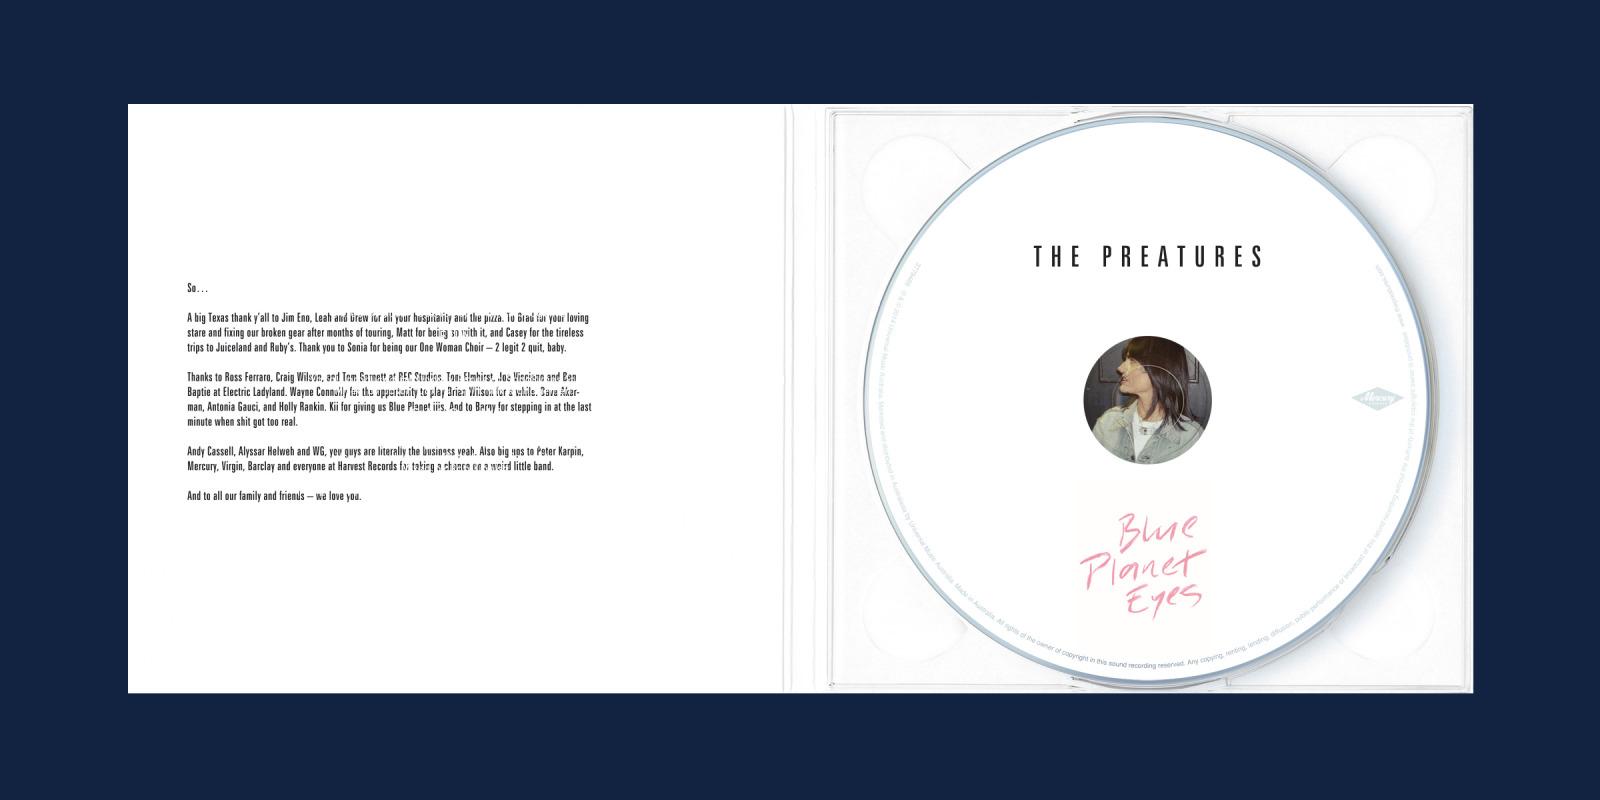 preatures_03